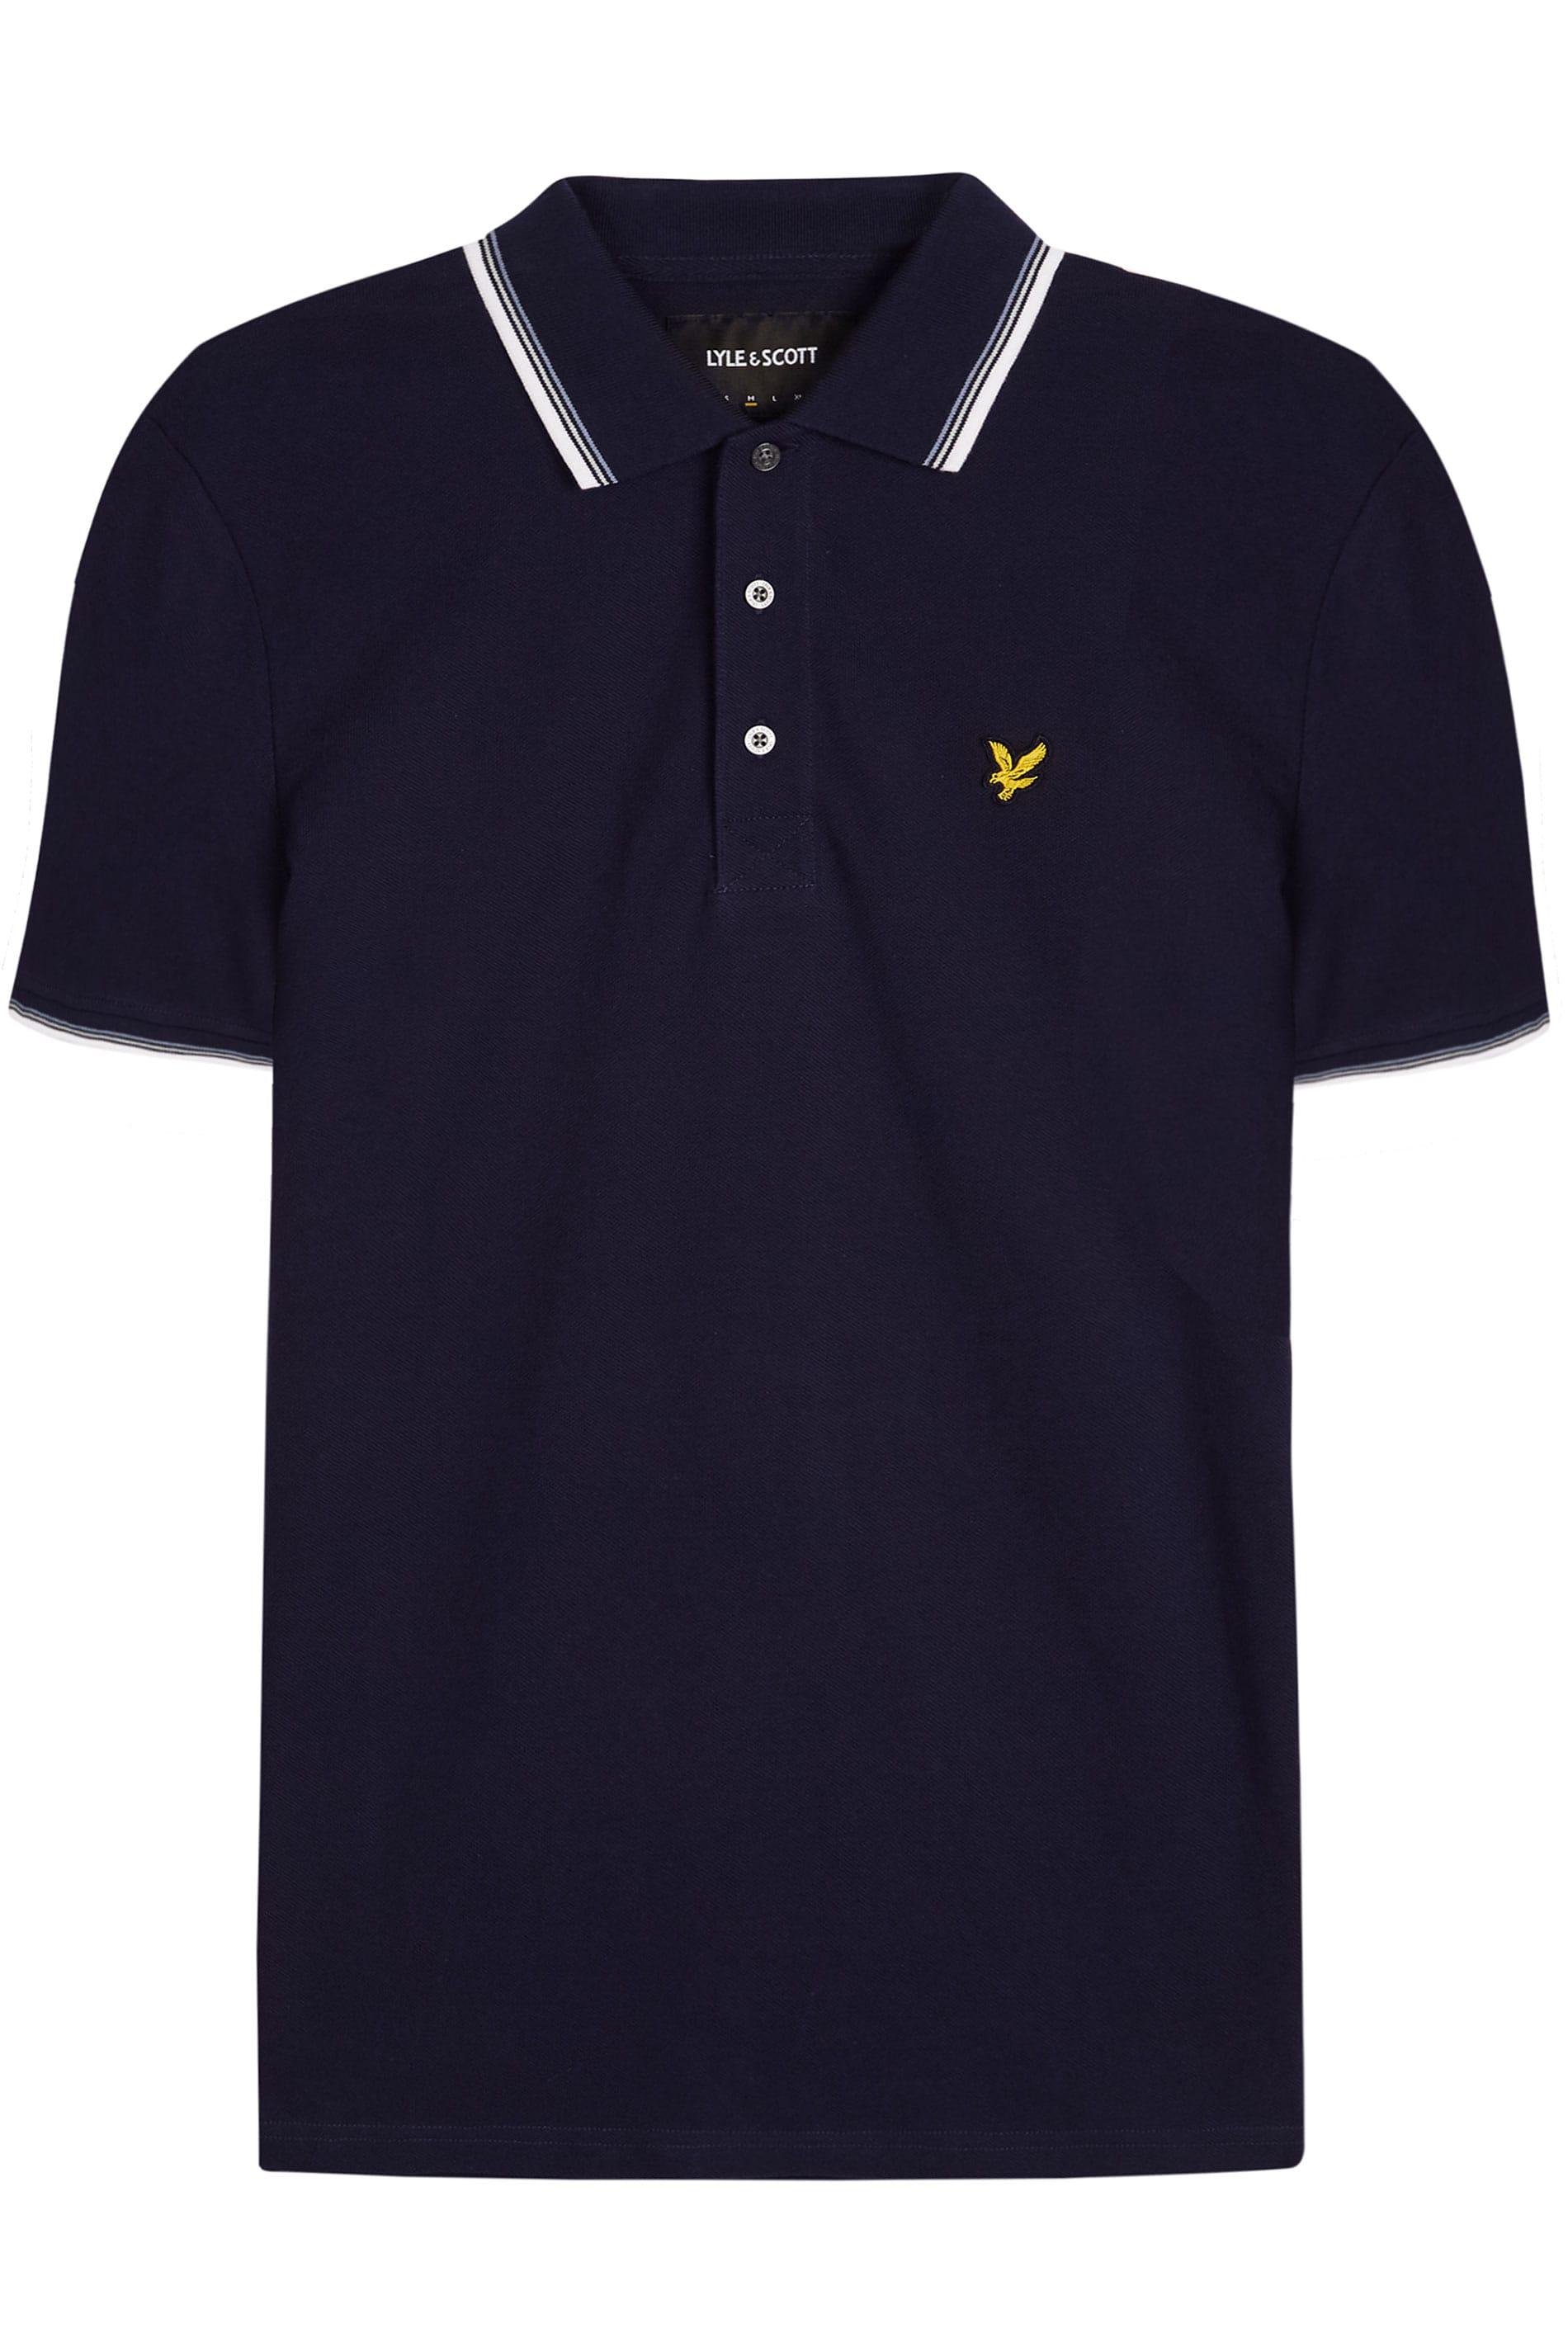 LYLE & SCOTT Navy Tipped Polo Shirt